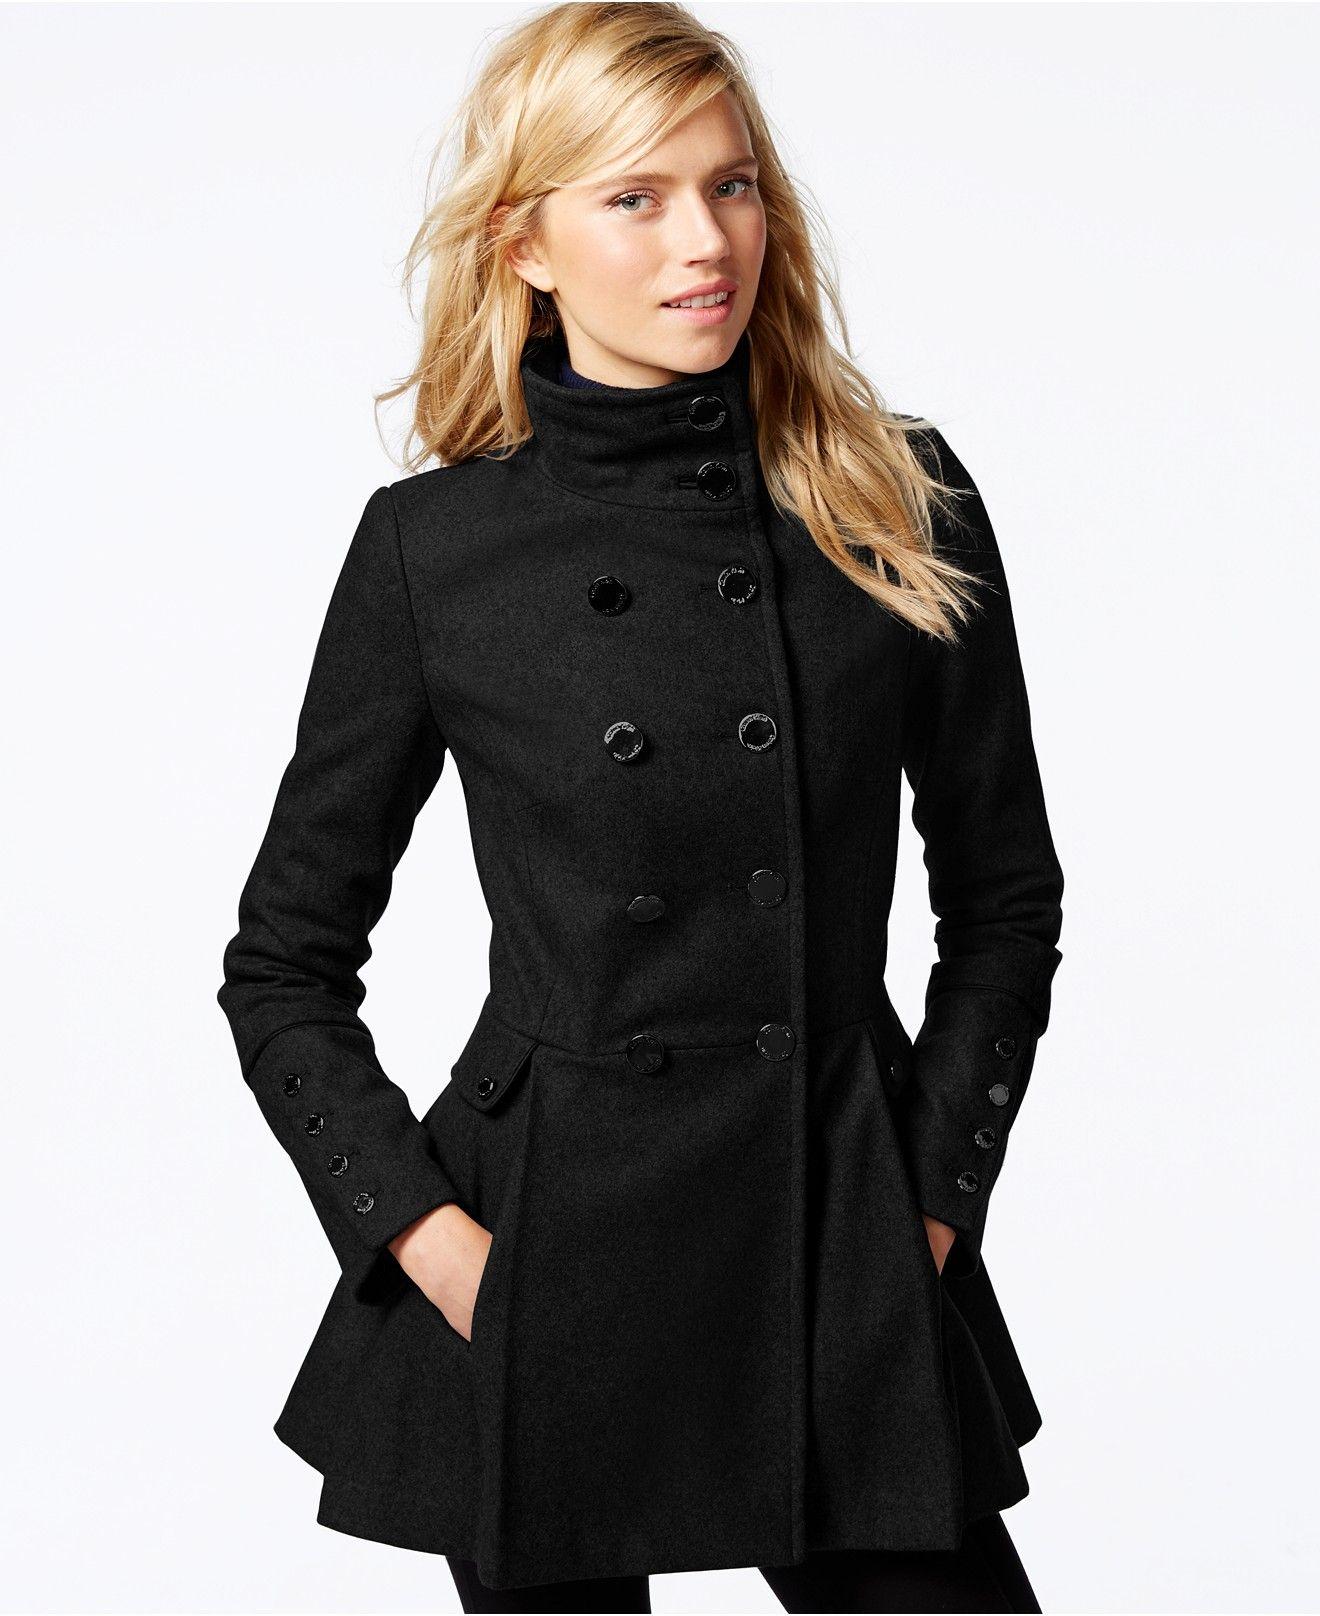 d206a6c215b Calvin Klein Stand-Collar Pleated Peacoat - Coats - Women - Macy s ...